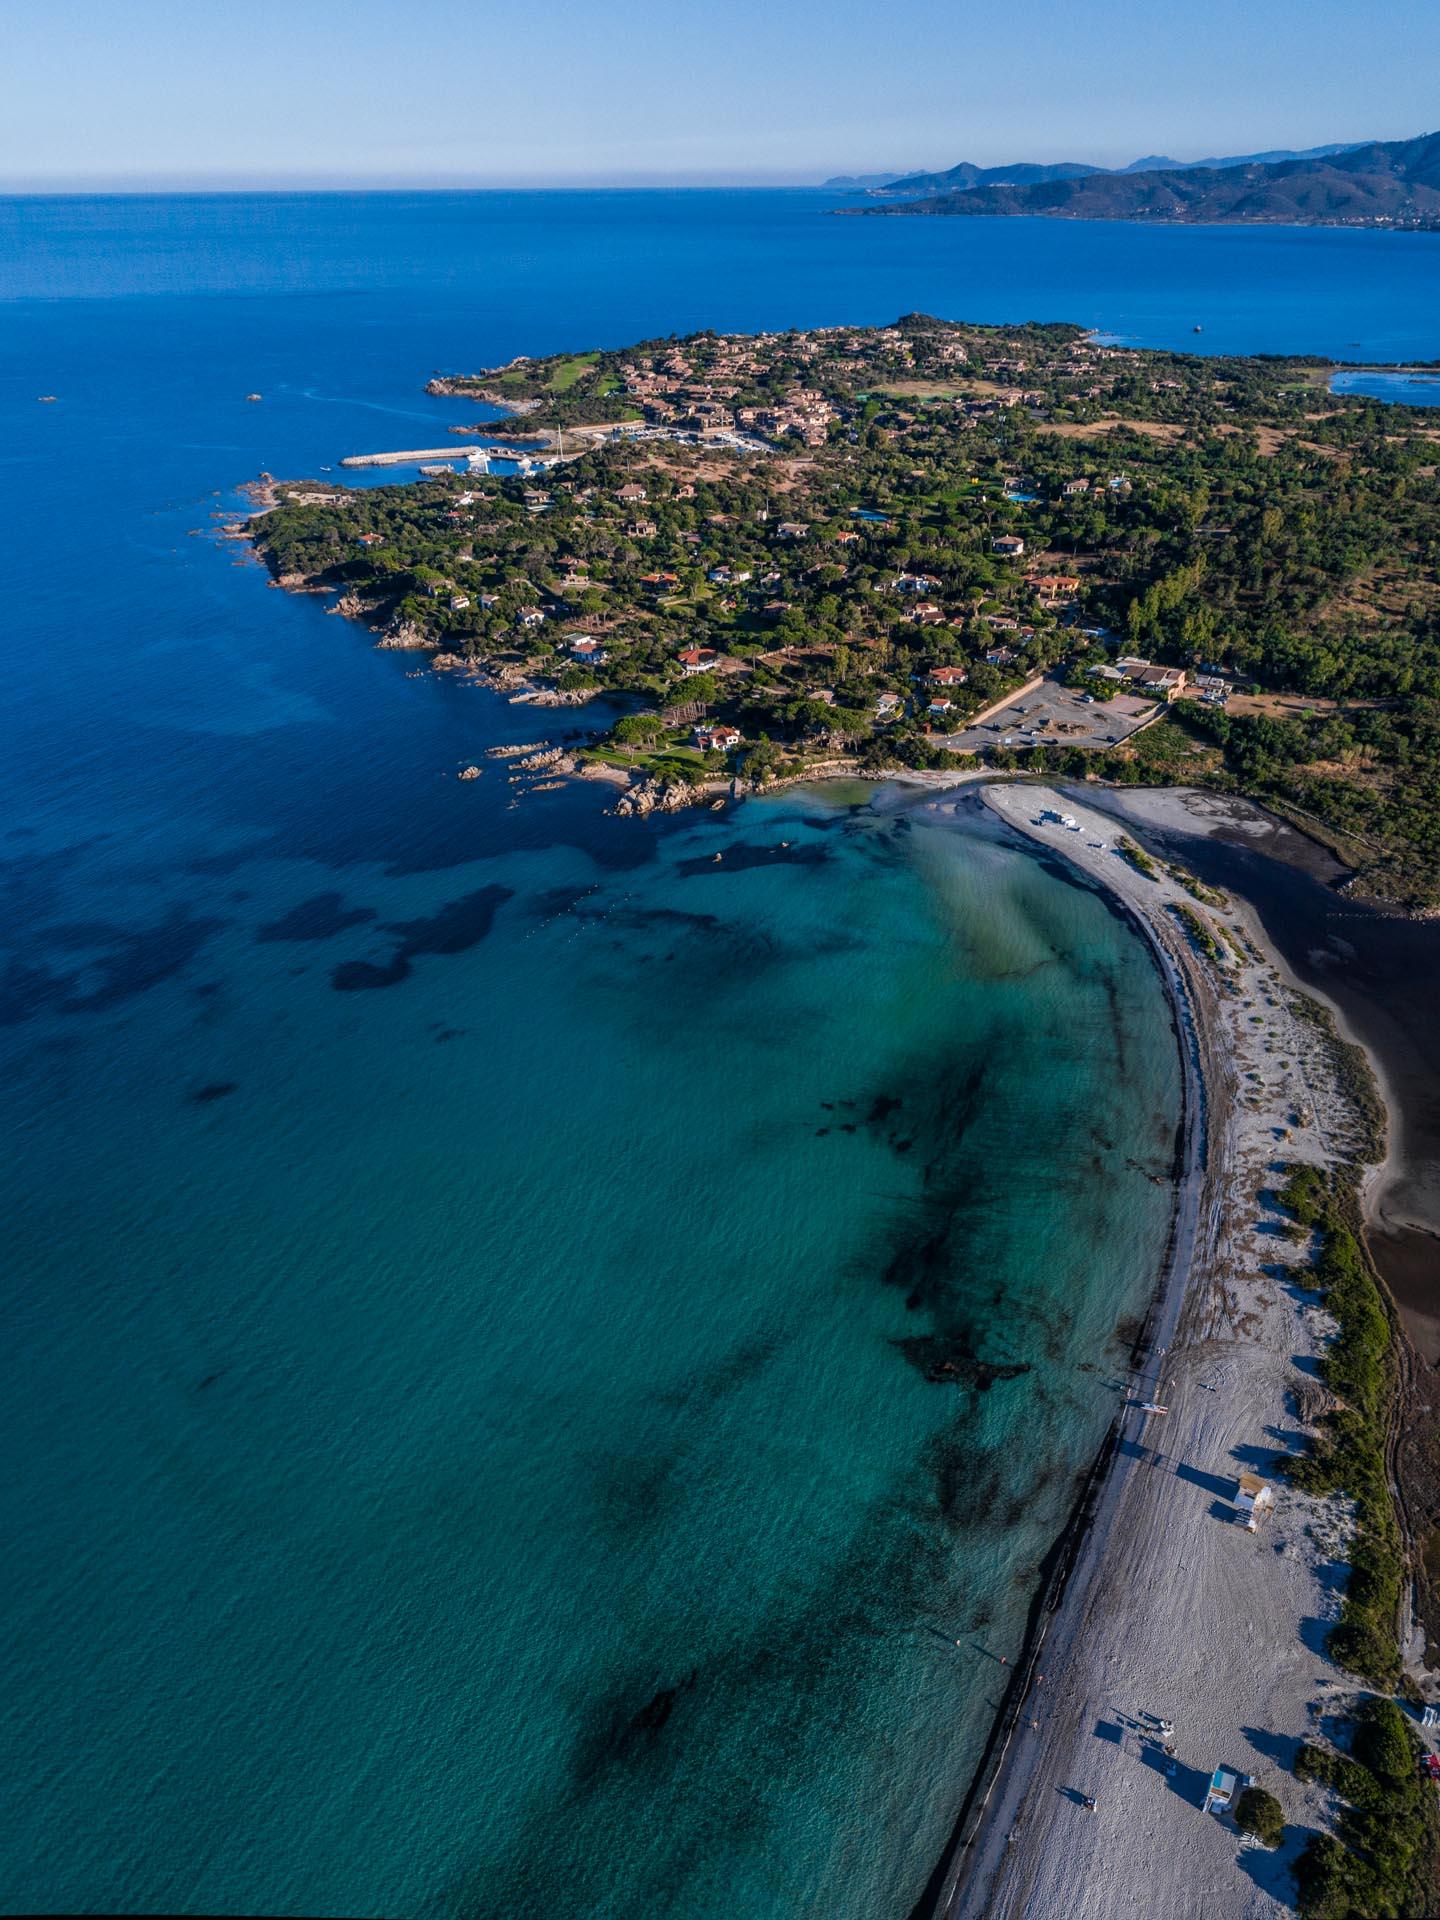 Lu Impostu - Sardinia Sardinia Aerial Photography drone Enrico Pescantini